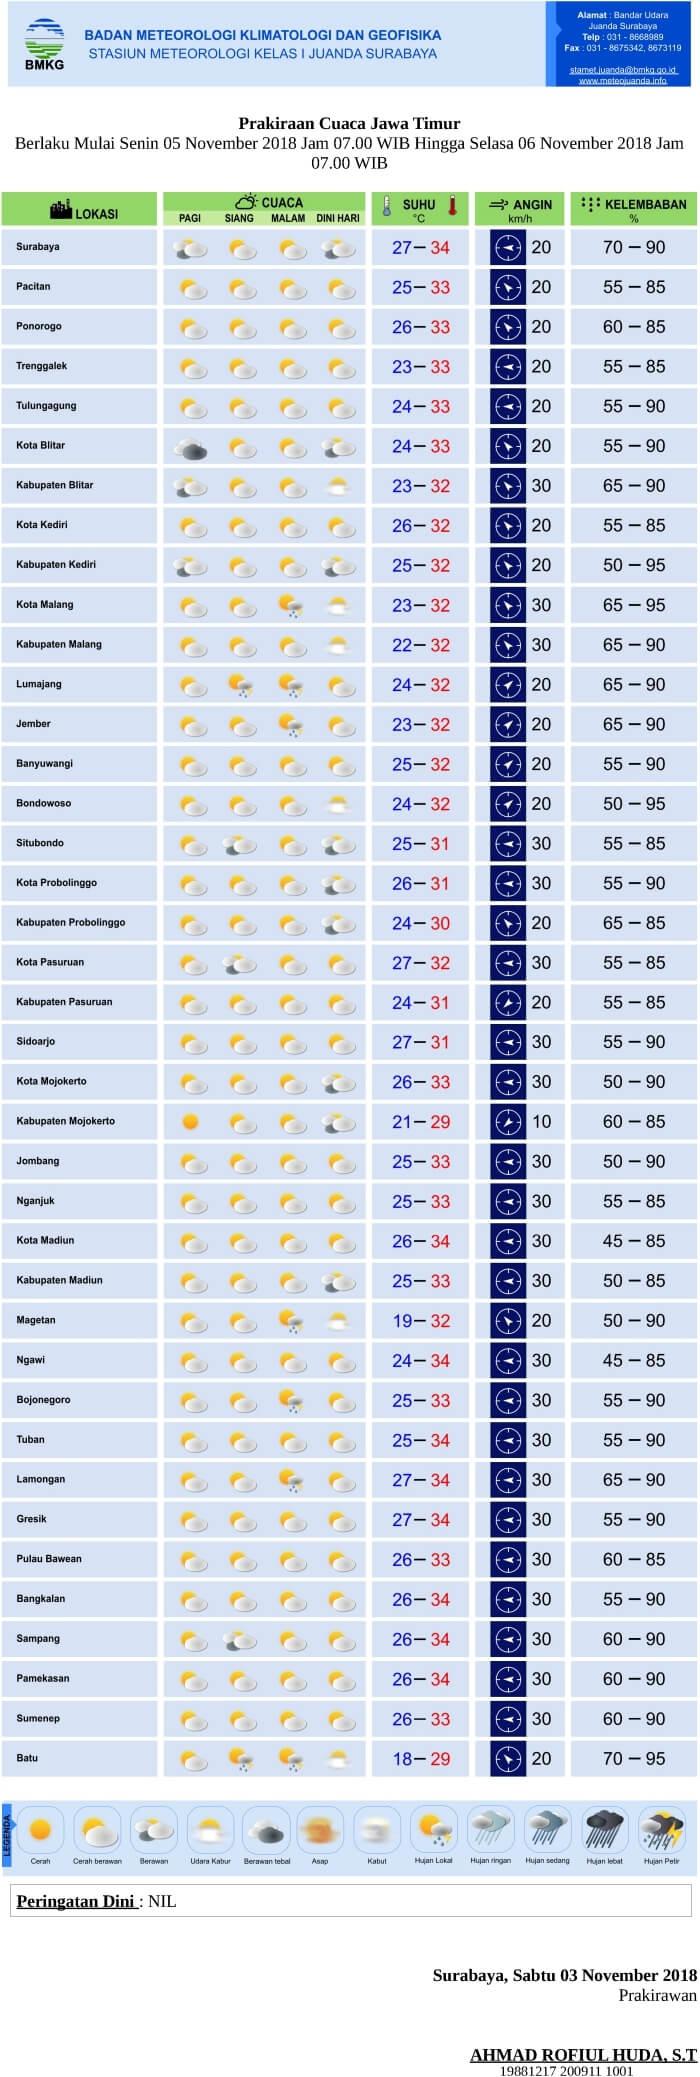 Prakiraan Cuaca LUSA HARI untuk Pagi-Siang-Malam-Dini Hari di Provinsi Jawa Timur Berlaku Mulai SENIN 5 NOVEMBER 2018 Jam 07.00 WIB Hingga SELASA 6 NOVEMBER 2018 Jam 07.00 WIB Update dari Analisis SABTU-3-11-2018